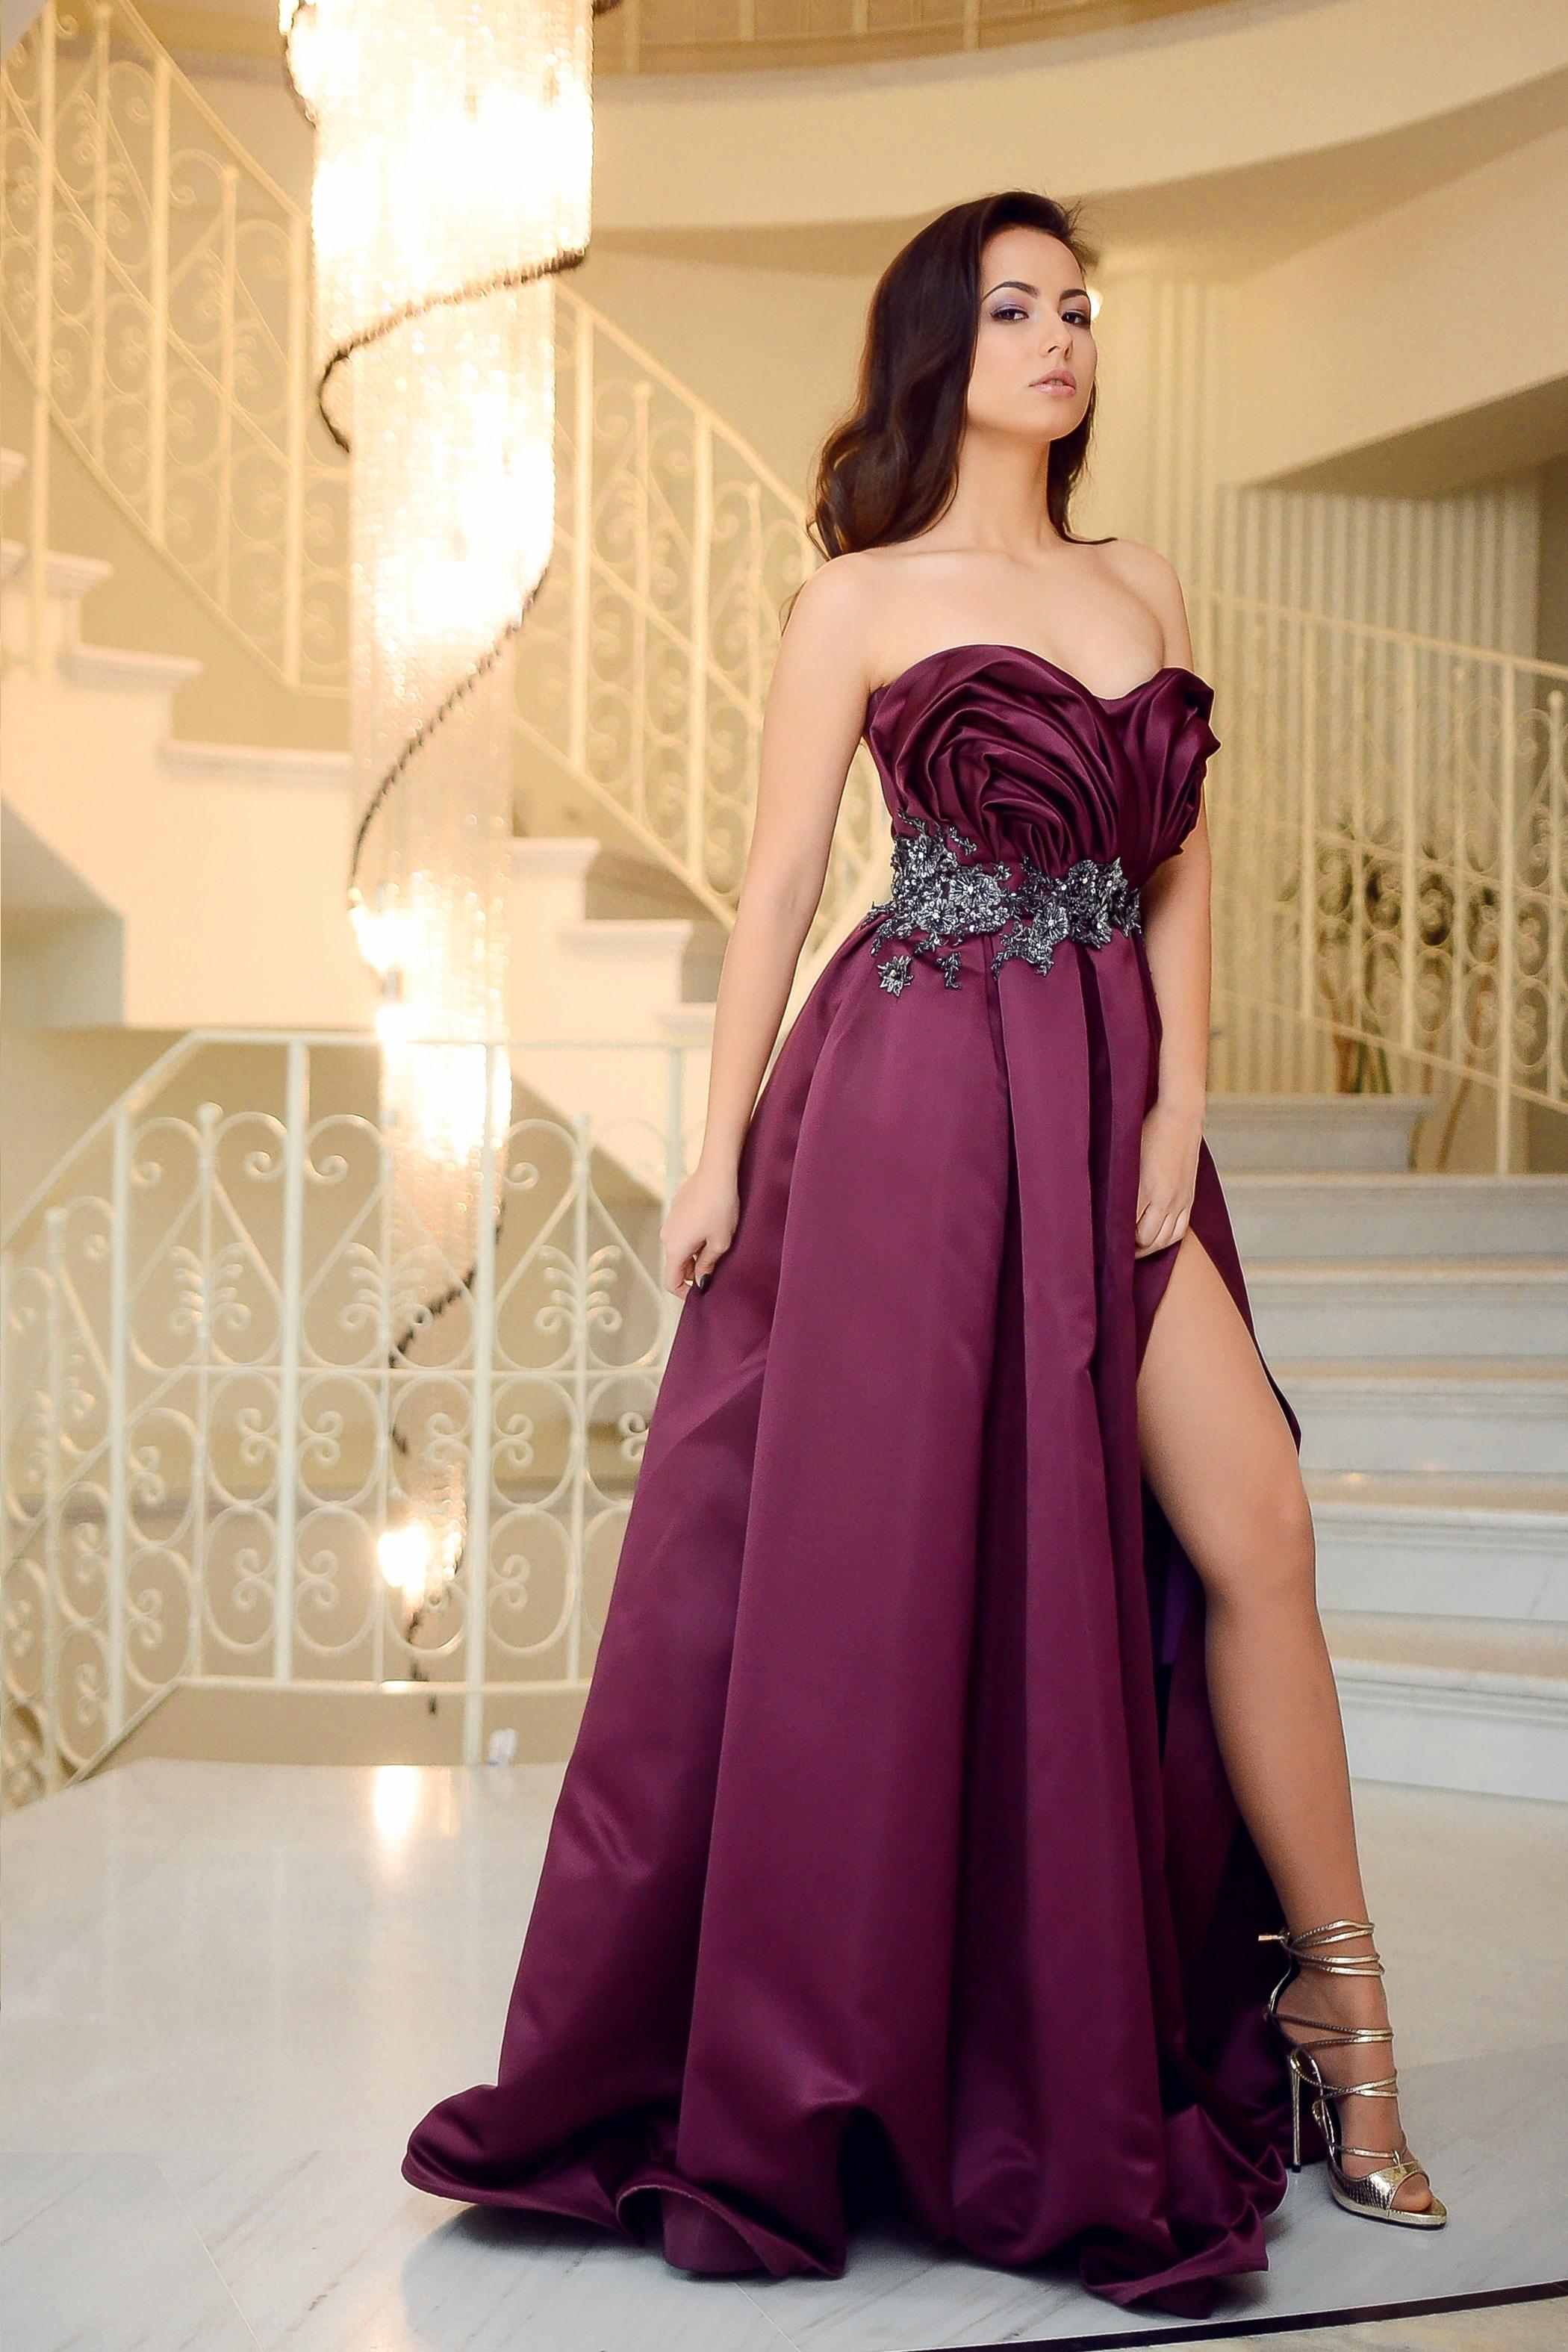 woman in maroon sweetheart gown